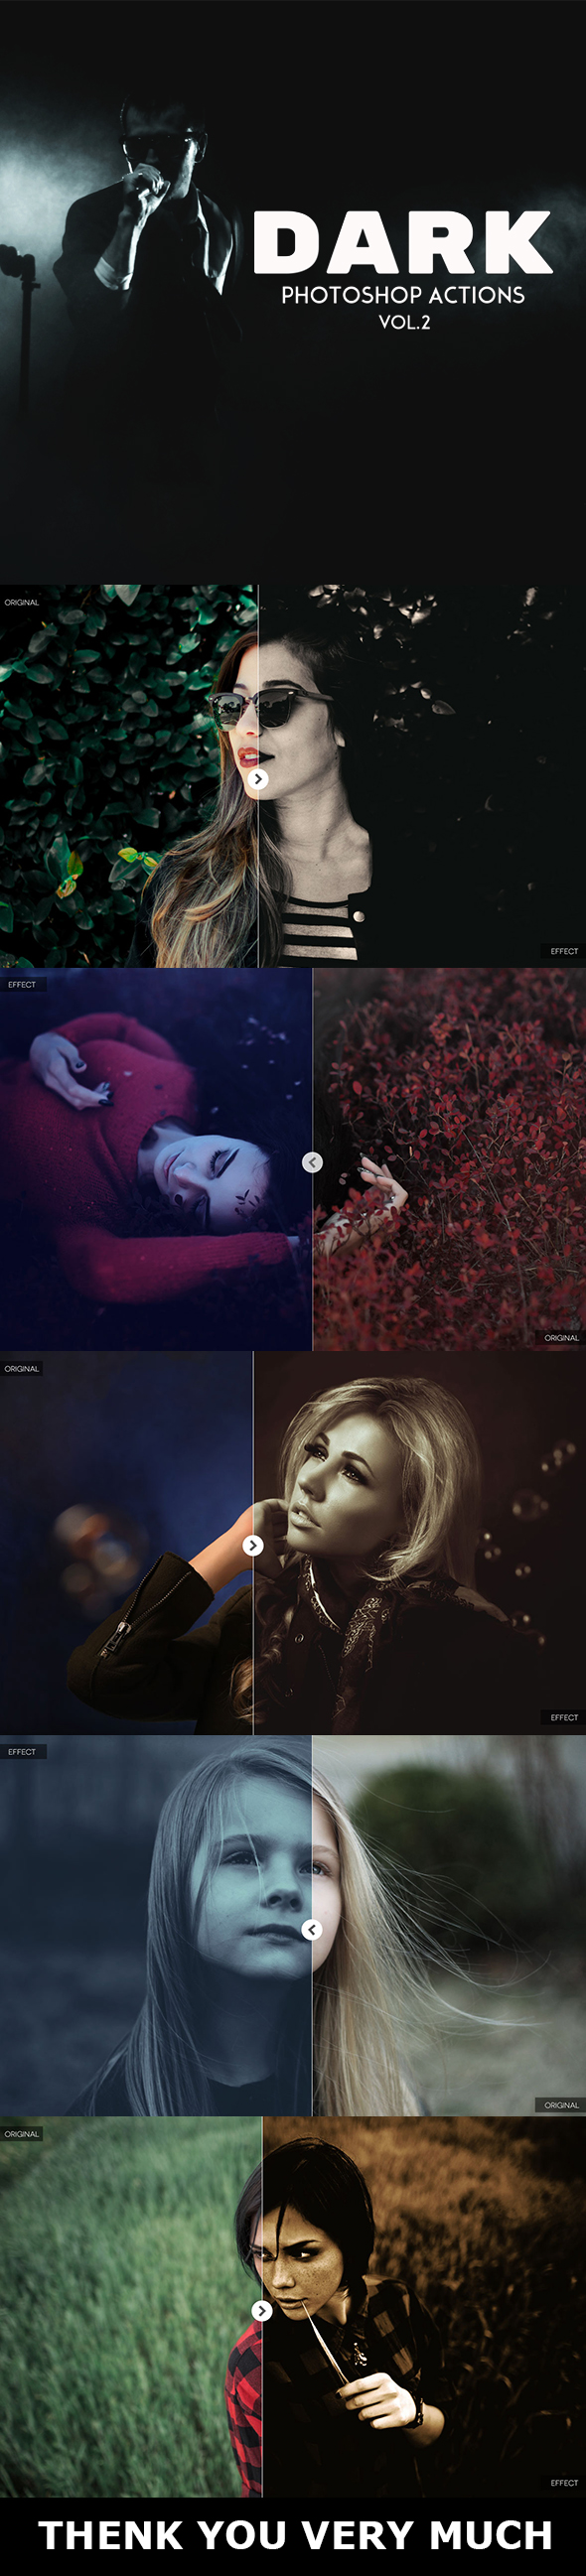 Dark Photoshop Actions Vol.2